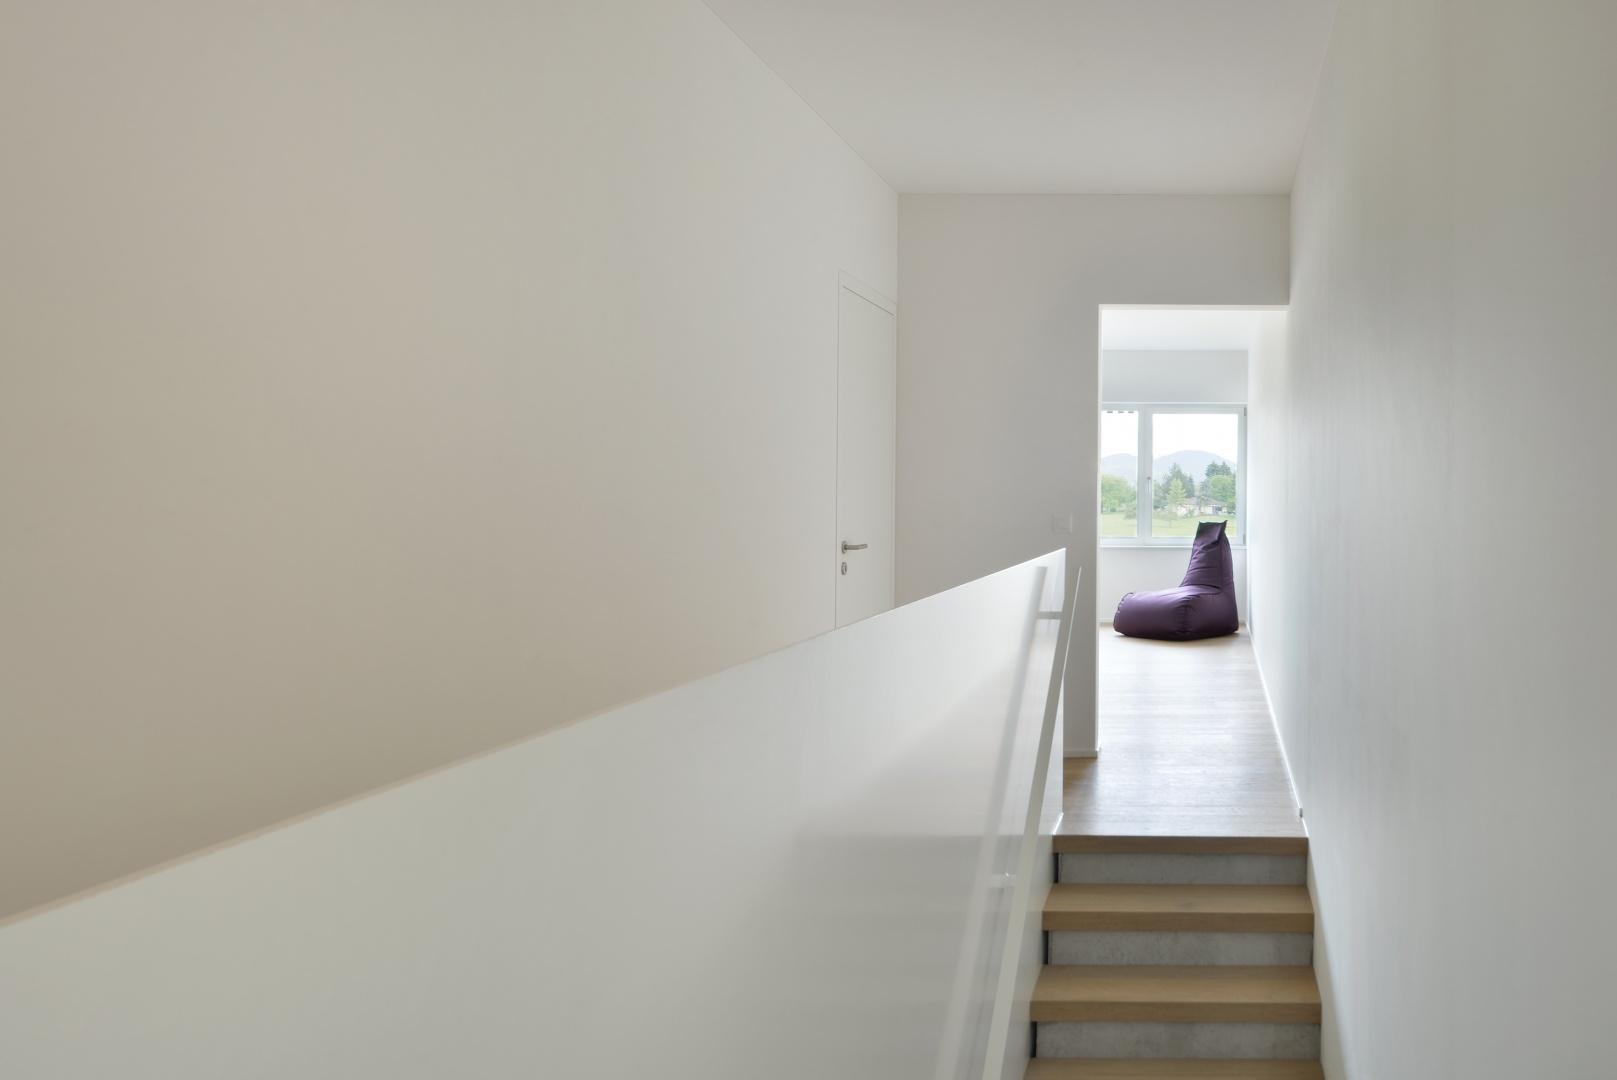 Korridor © Sabrina Scheja, Berneckerstrasse 215, CH-9435 Heerbrugg